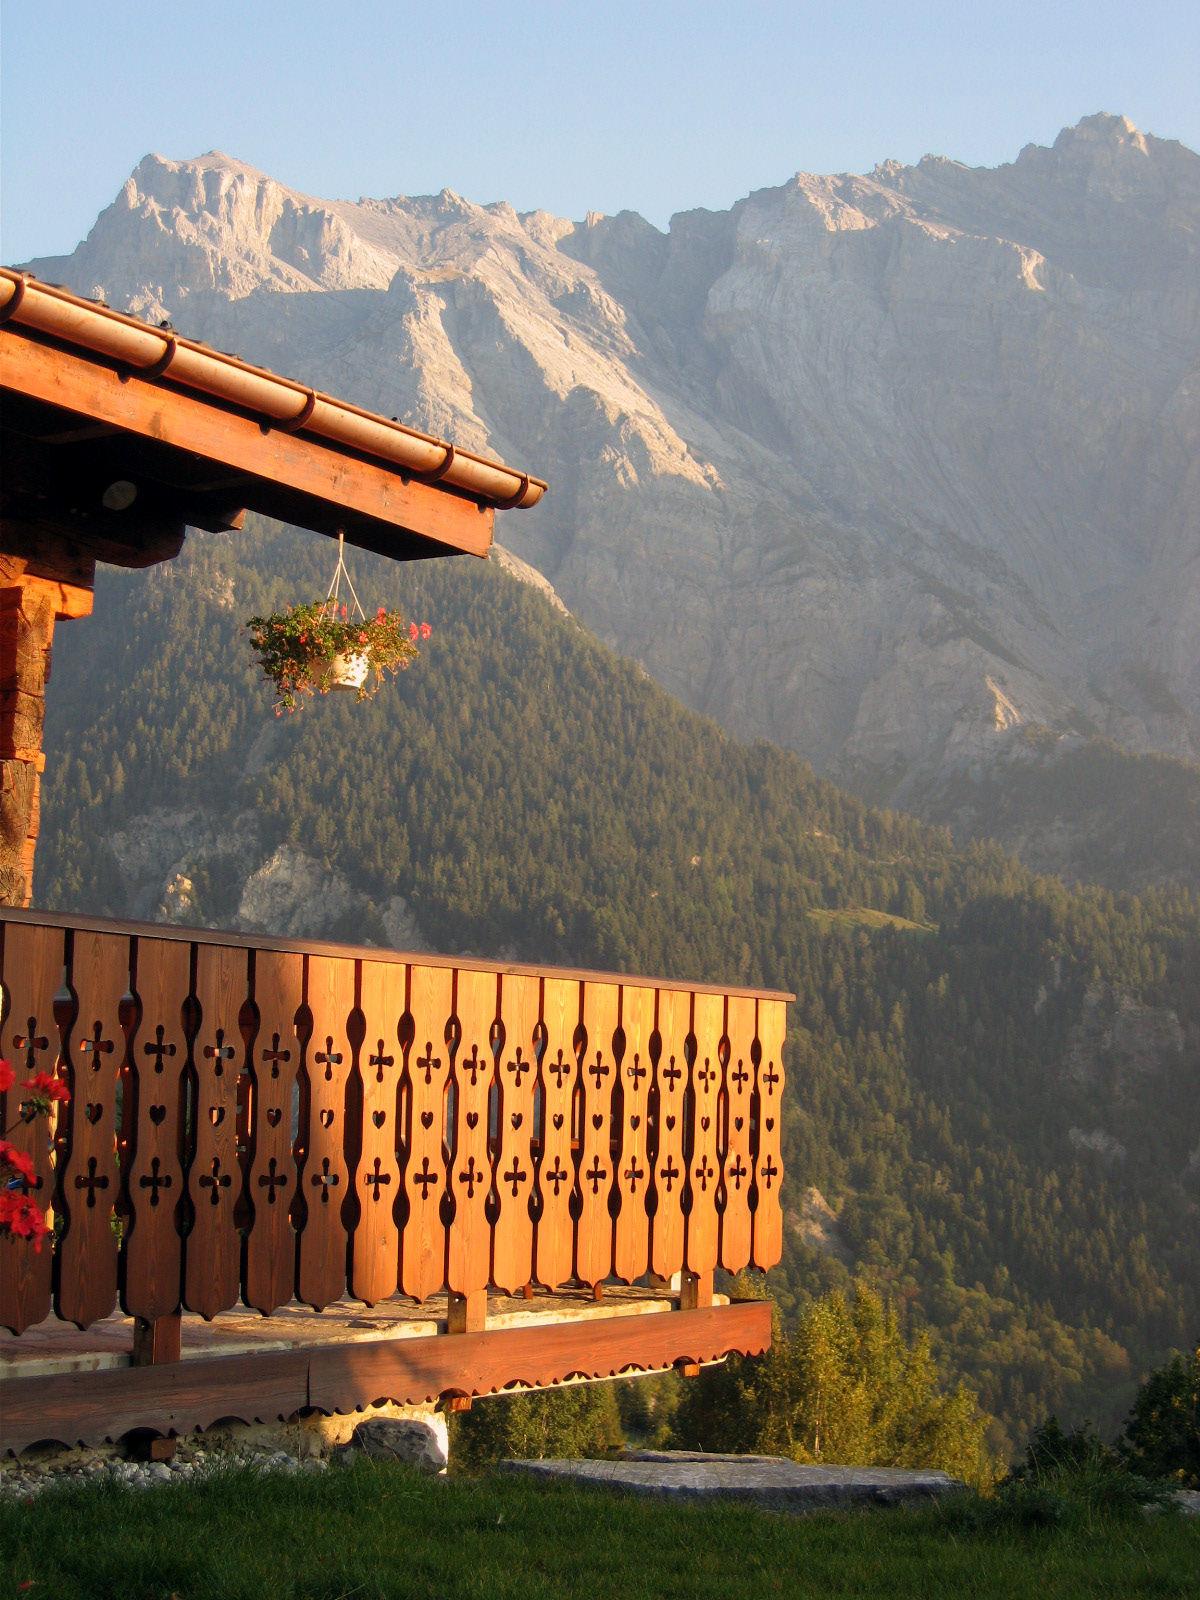 Meuble Salle De Bain Cmr ~ chalet de charme ovronnaz valais suisse swiss alps boligbytte